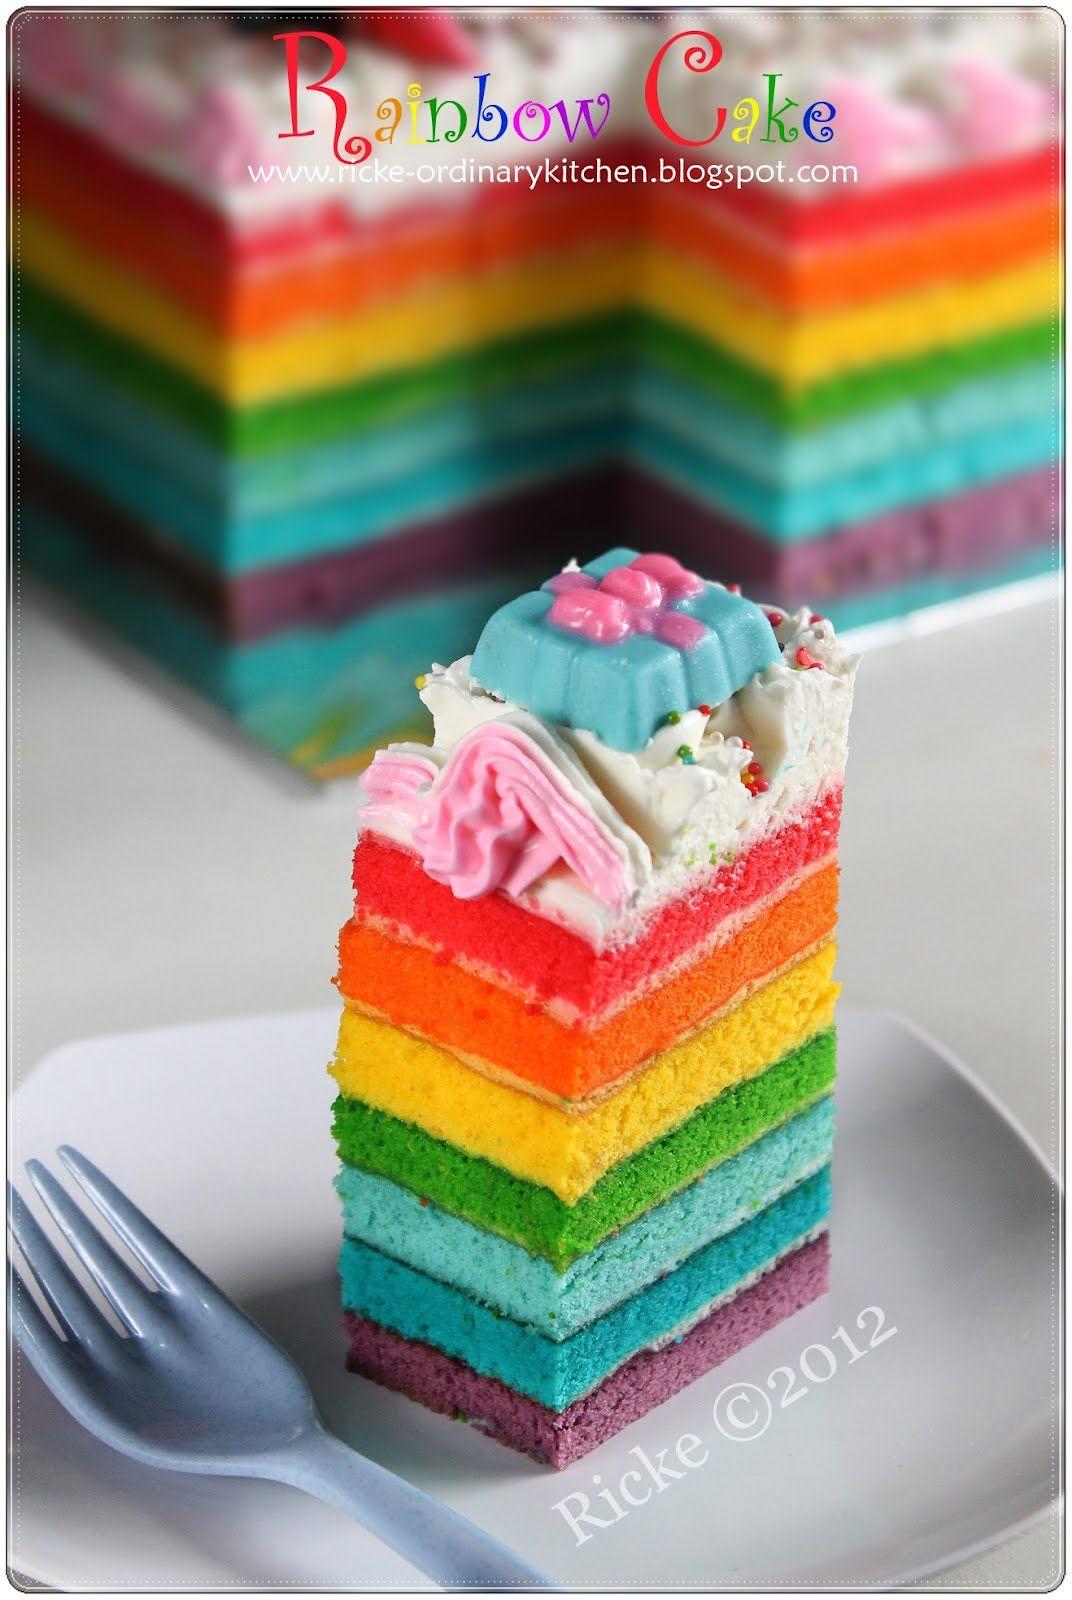 Yeap This Is The Happening Cake Nowaday Telat Banget Ya Baru Posting Rainbow Cake Sekarang Kemana Aja Bun Heheh Kue Pelangi Kue Lezat Makanan Ringan Manis